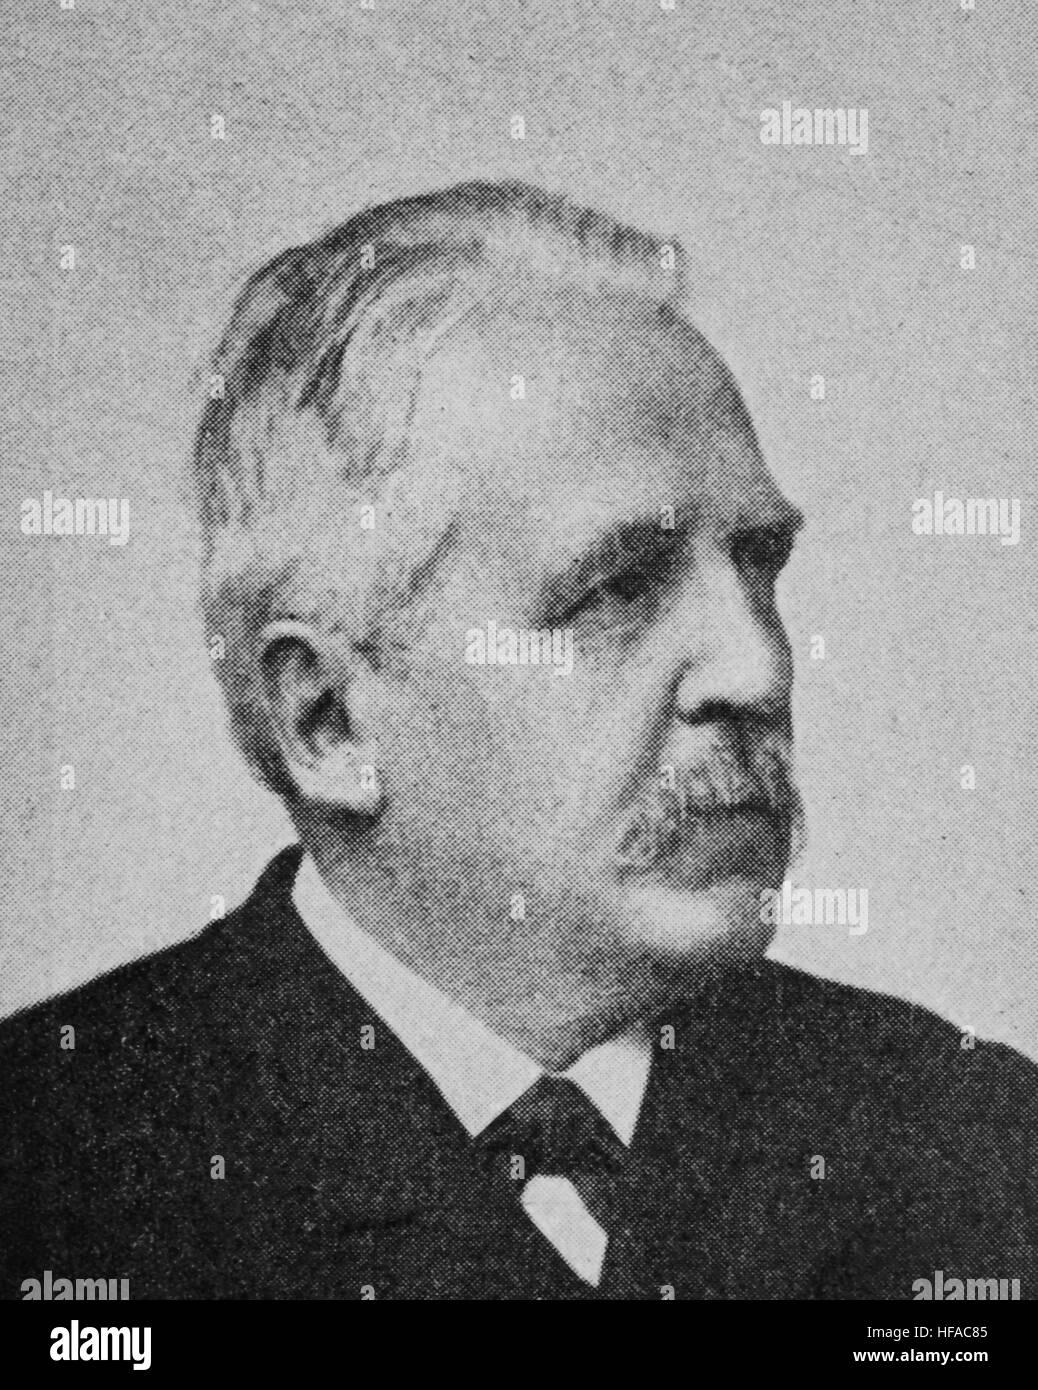 Albert Eberhard Friedrich Schaeffle, 1831-1903, a German sociologist, political economist, and newspaper editor, - Stock Image